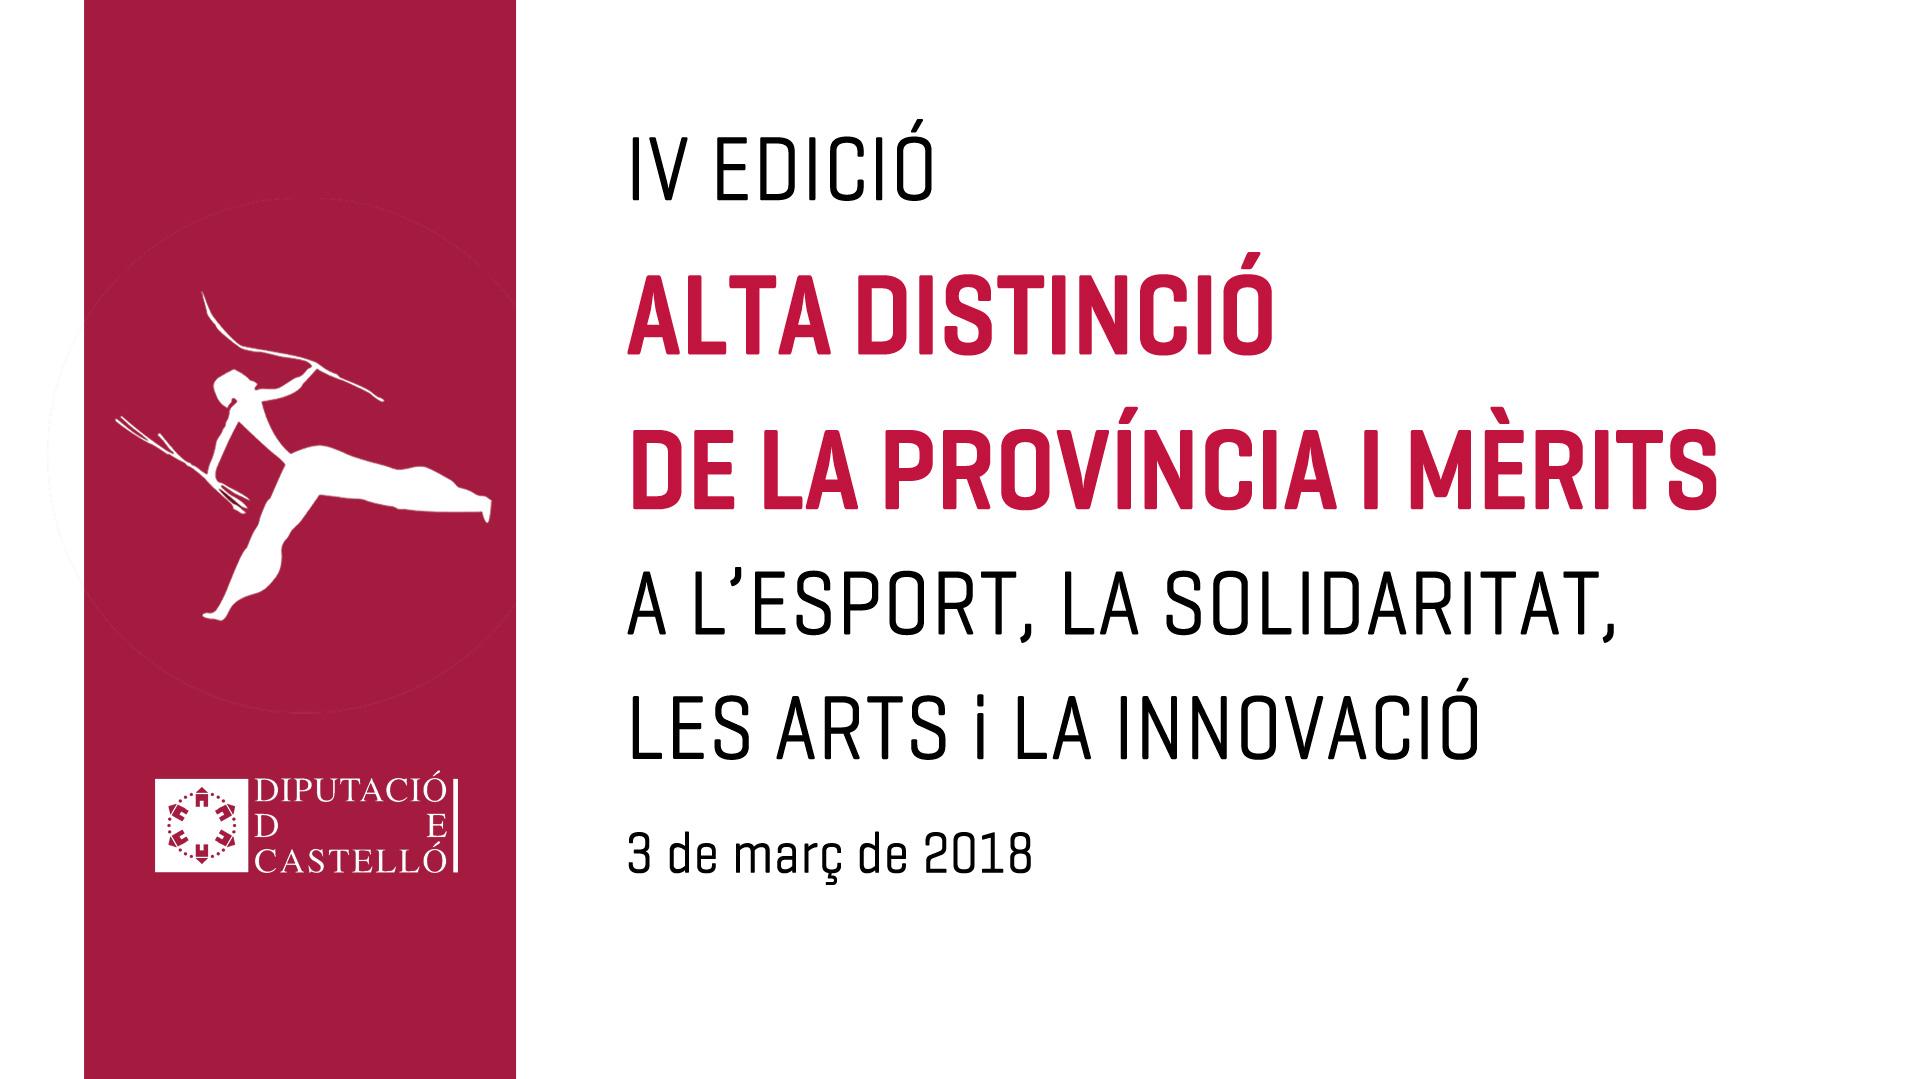 Dia de la provincia 2018